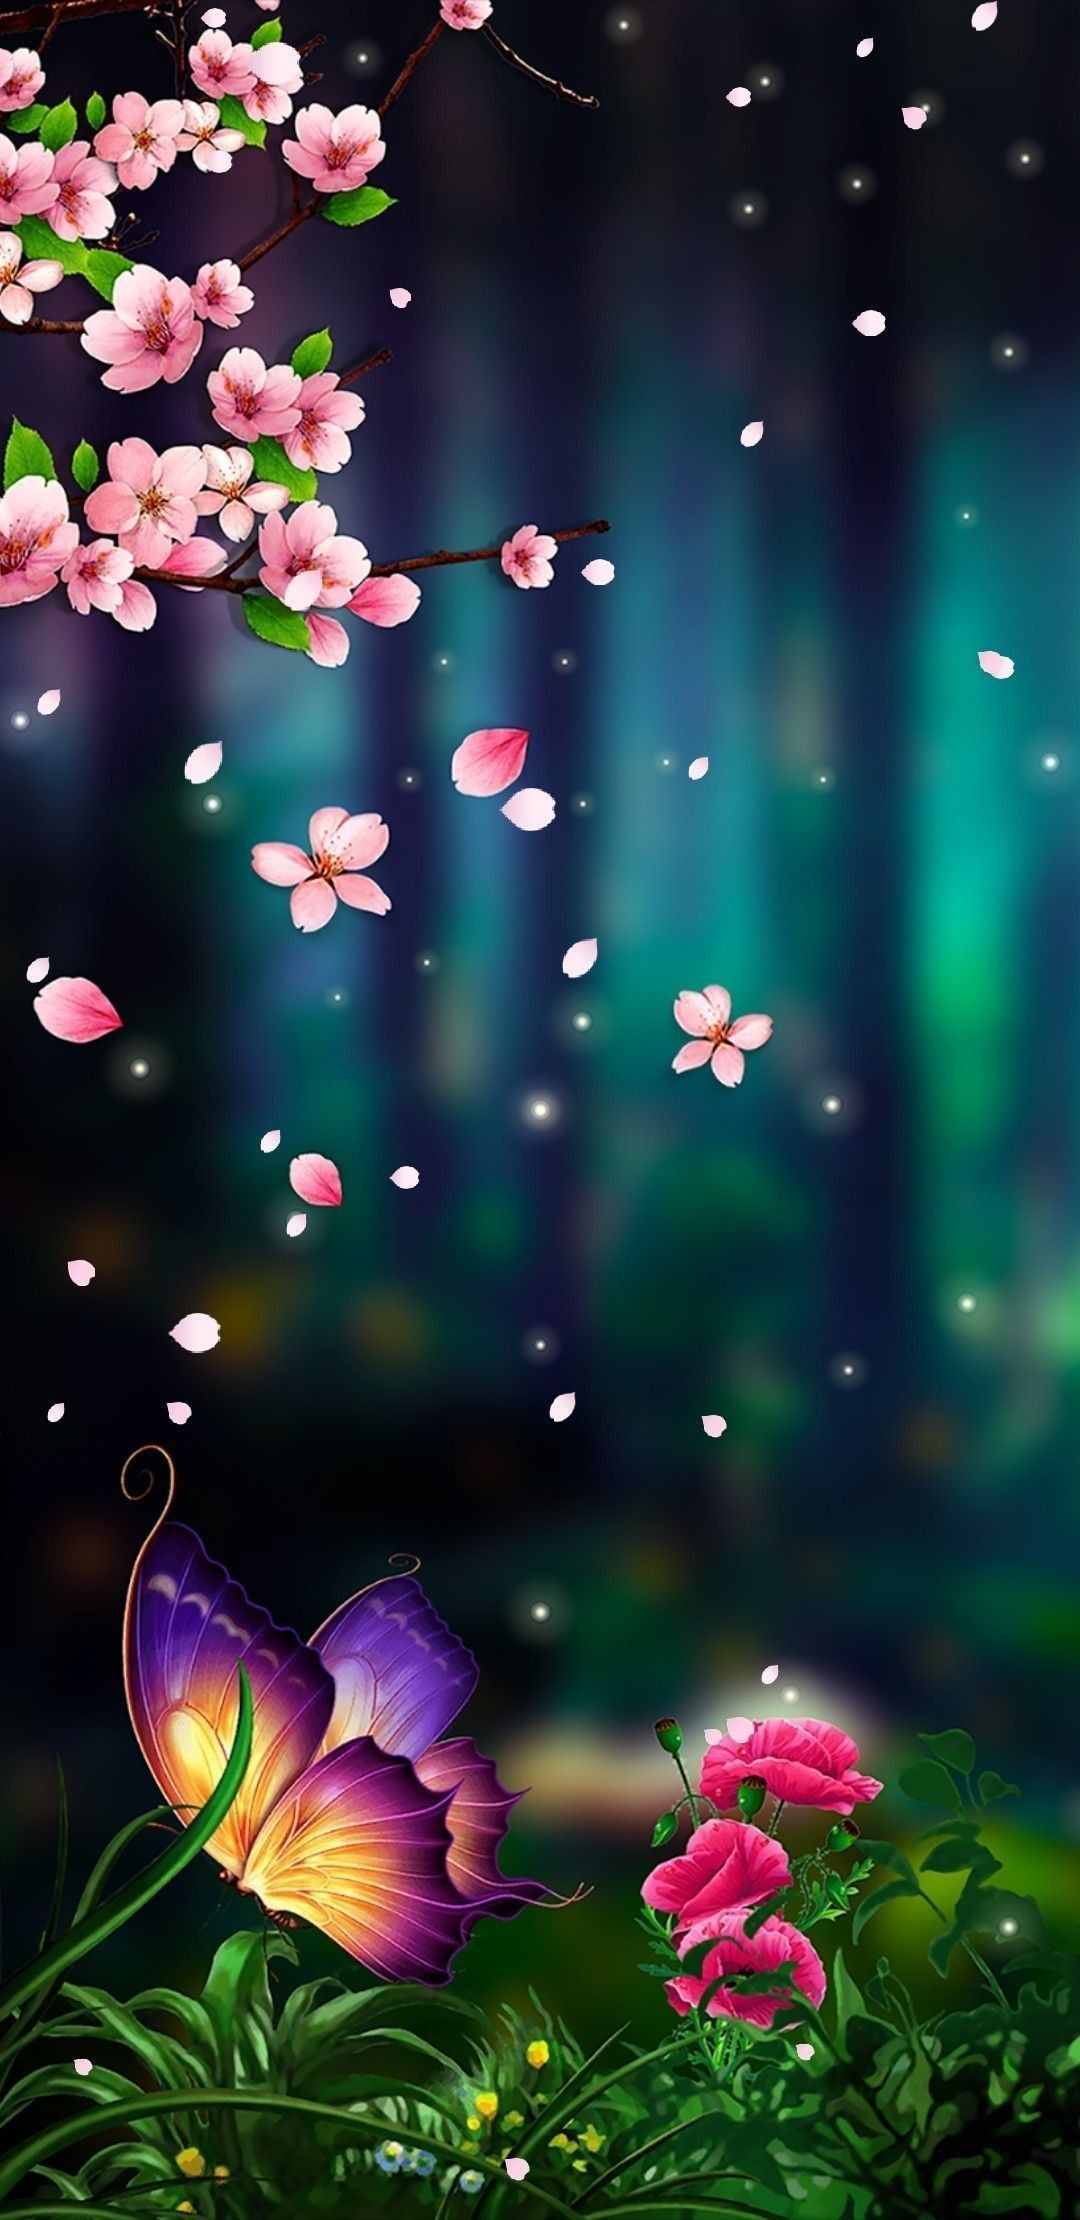 Pin by 💕AaFreen Shaikh💕 on (⚘Wallpepar⚘) Beautiful